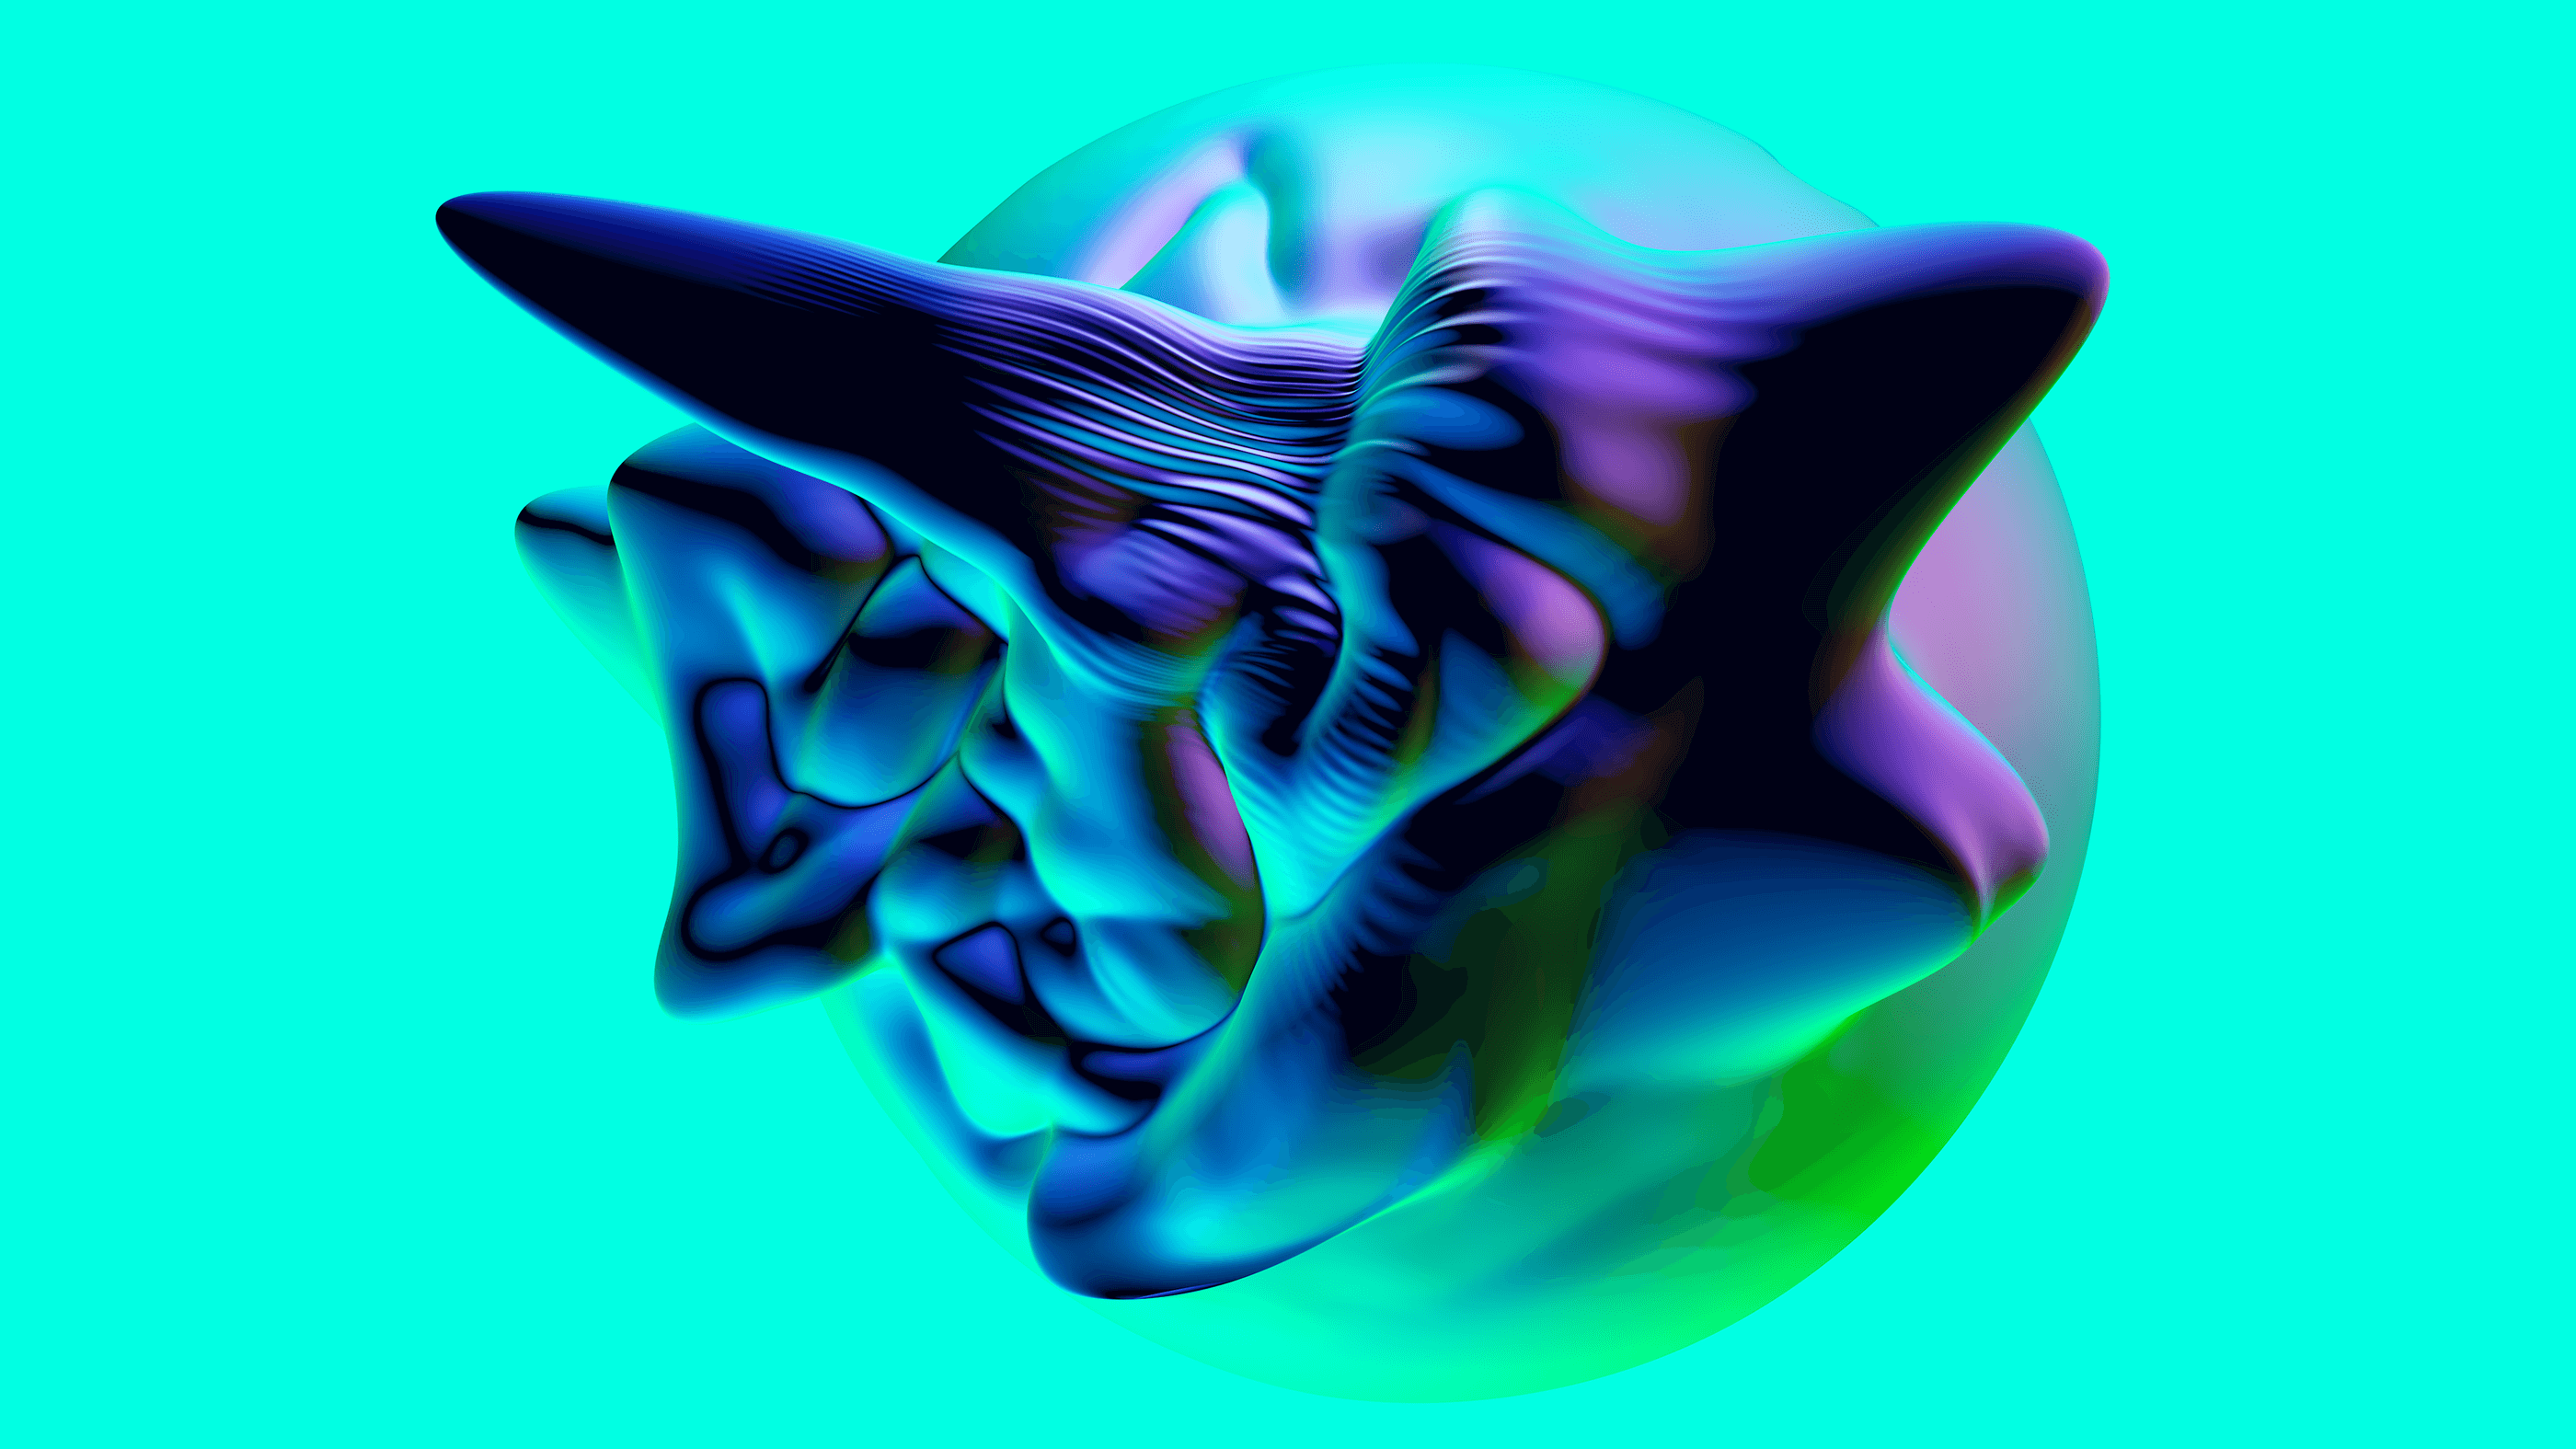 BlueTurquoise 4